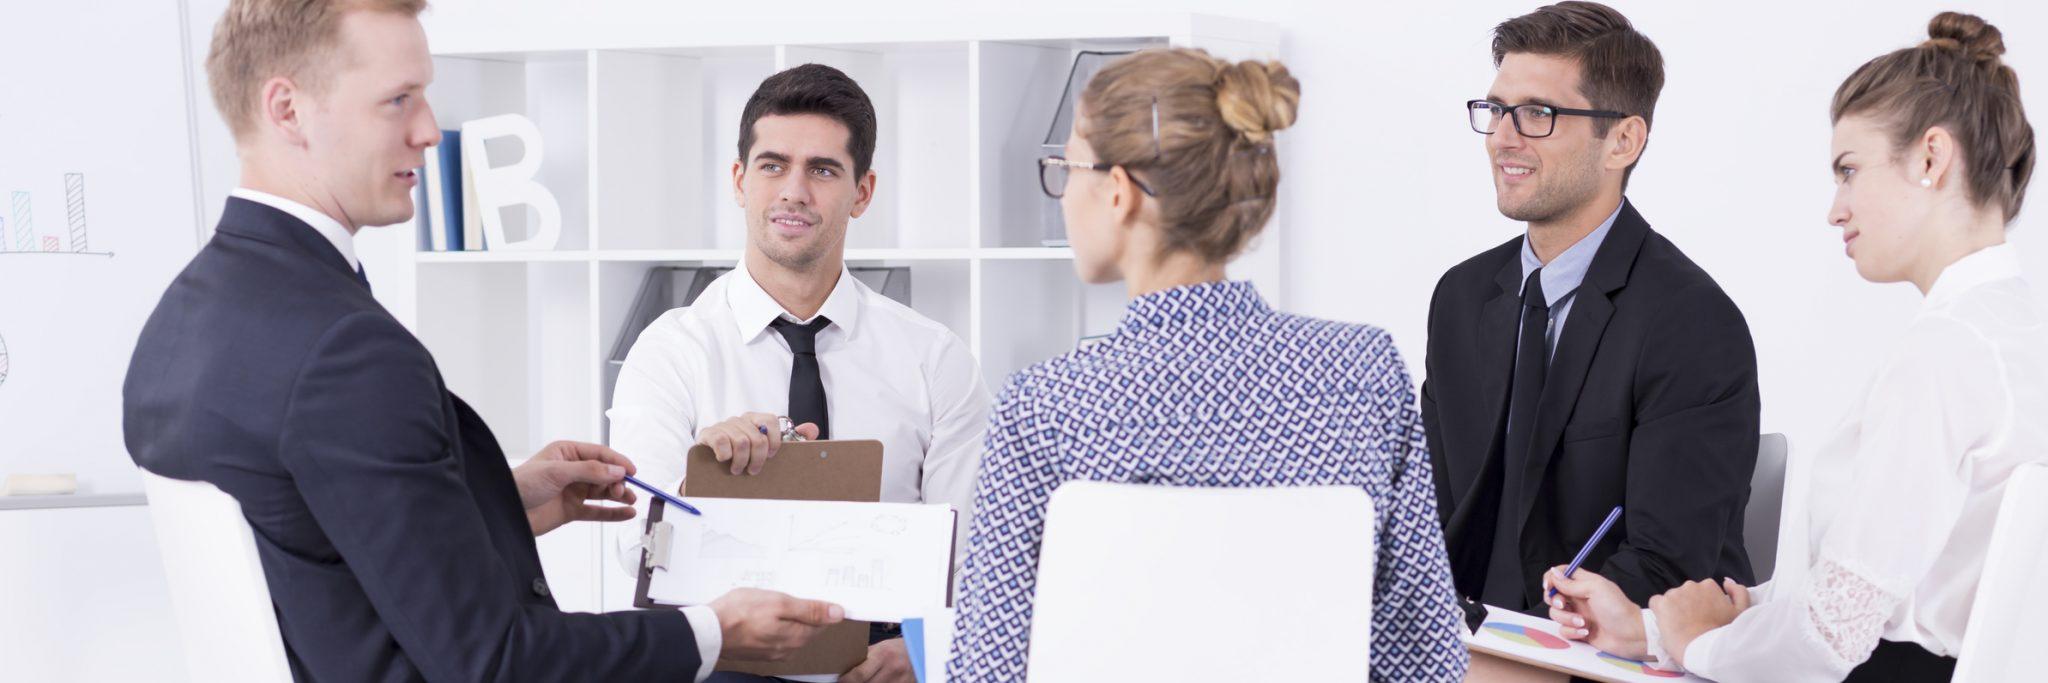 jobs board - professional exporter